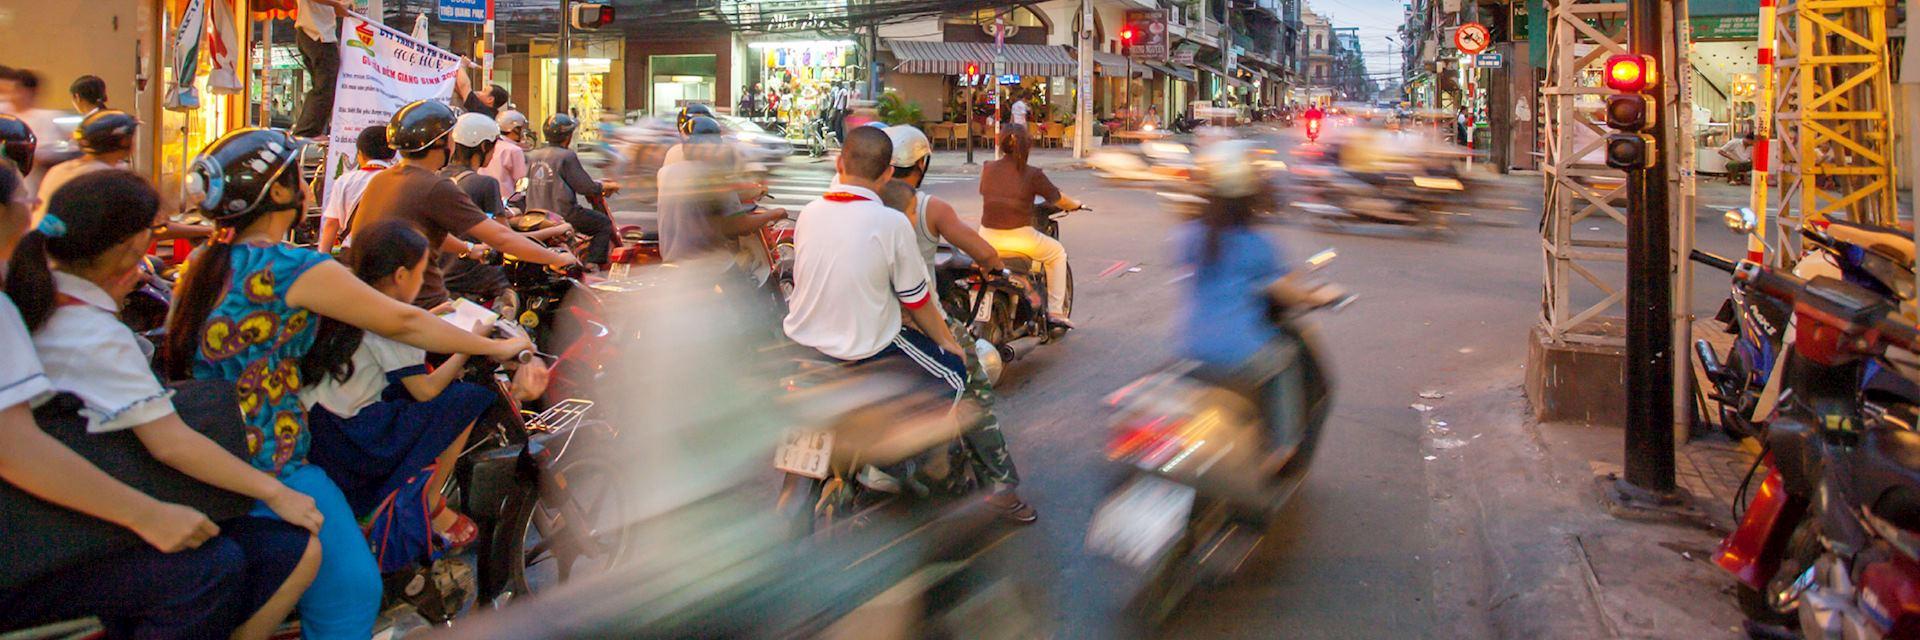 Vespas in Saigon, Vietnam